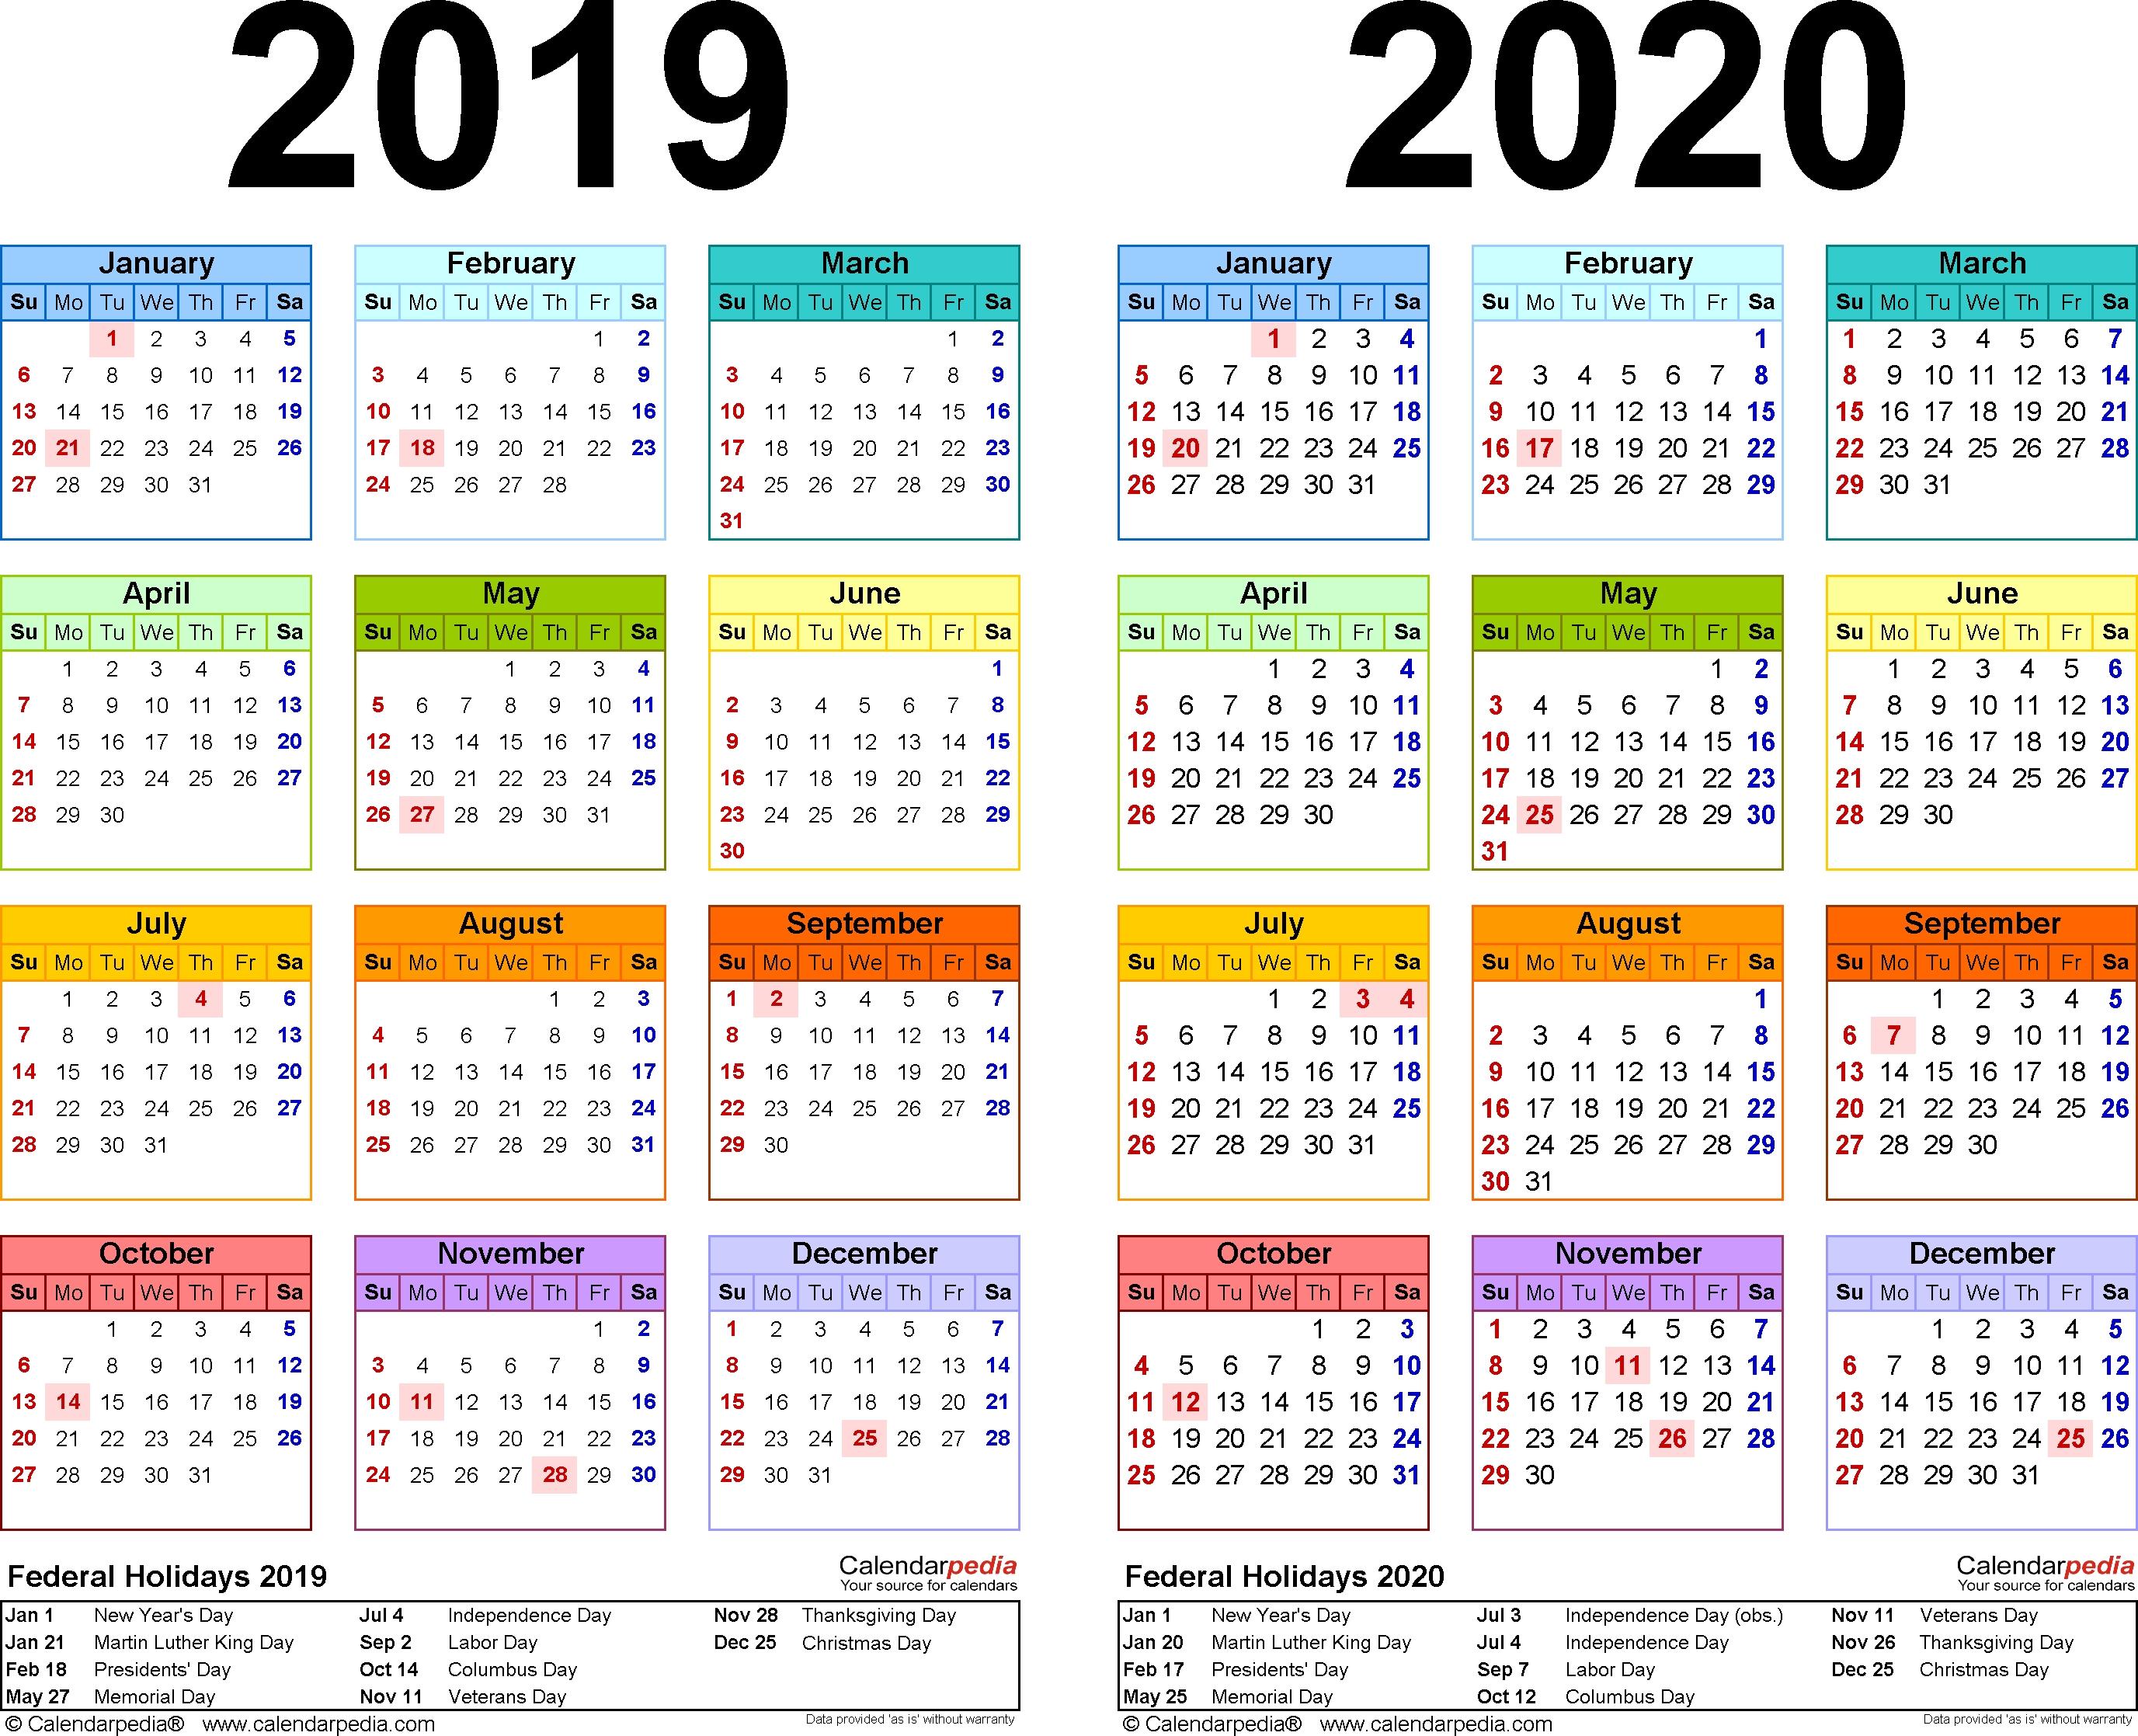 2019 2020 School Year Calendar With Holiday Us - Google-Calendar School Holidays 2020 Sa Printable